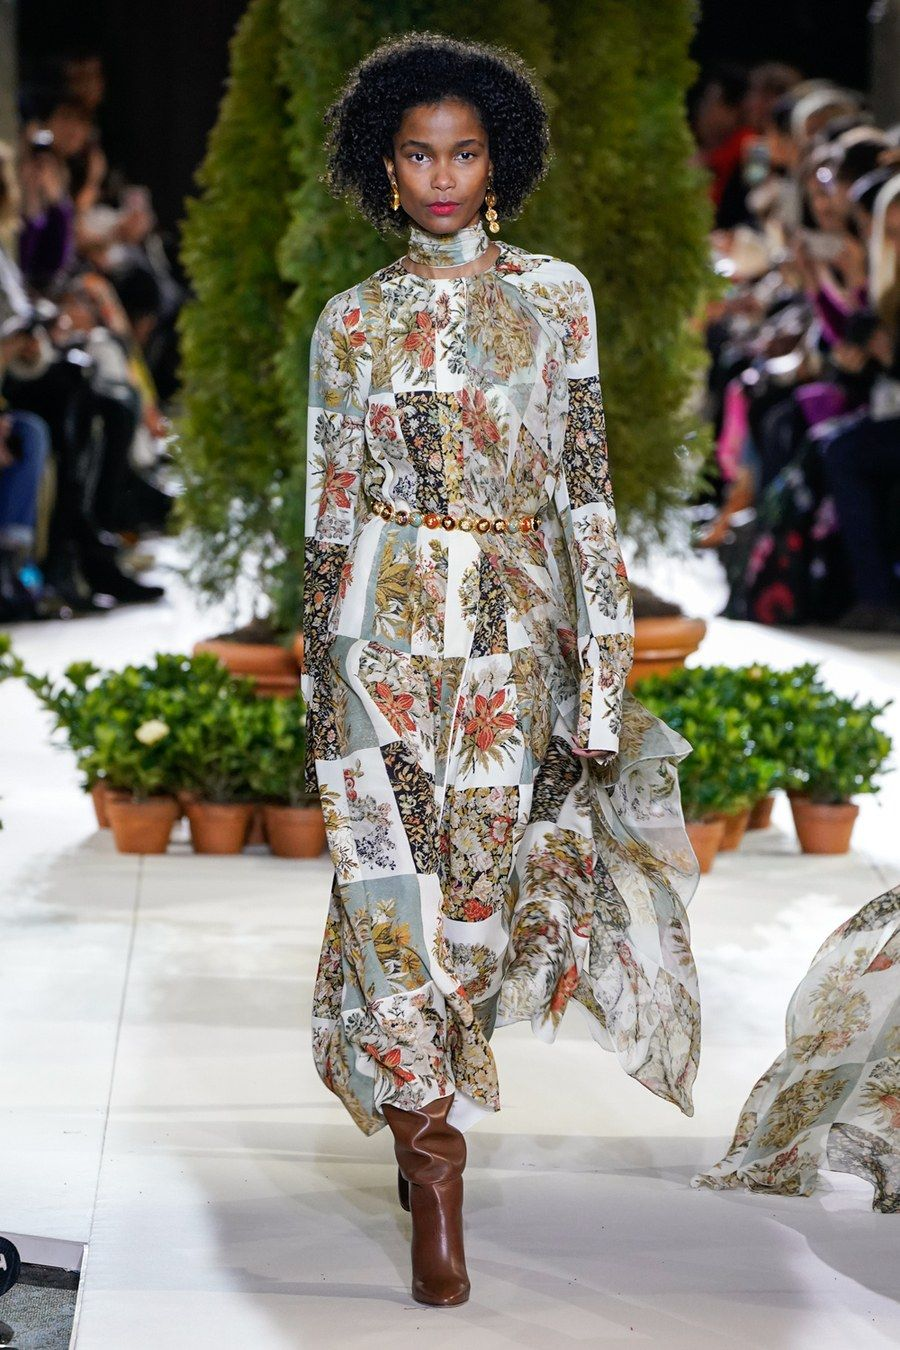 Oscar de la Renta Fall 2019 Ready-to-Wear Fashion